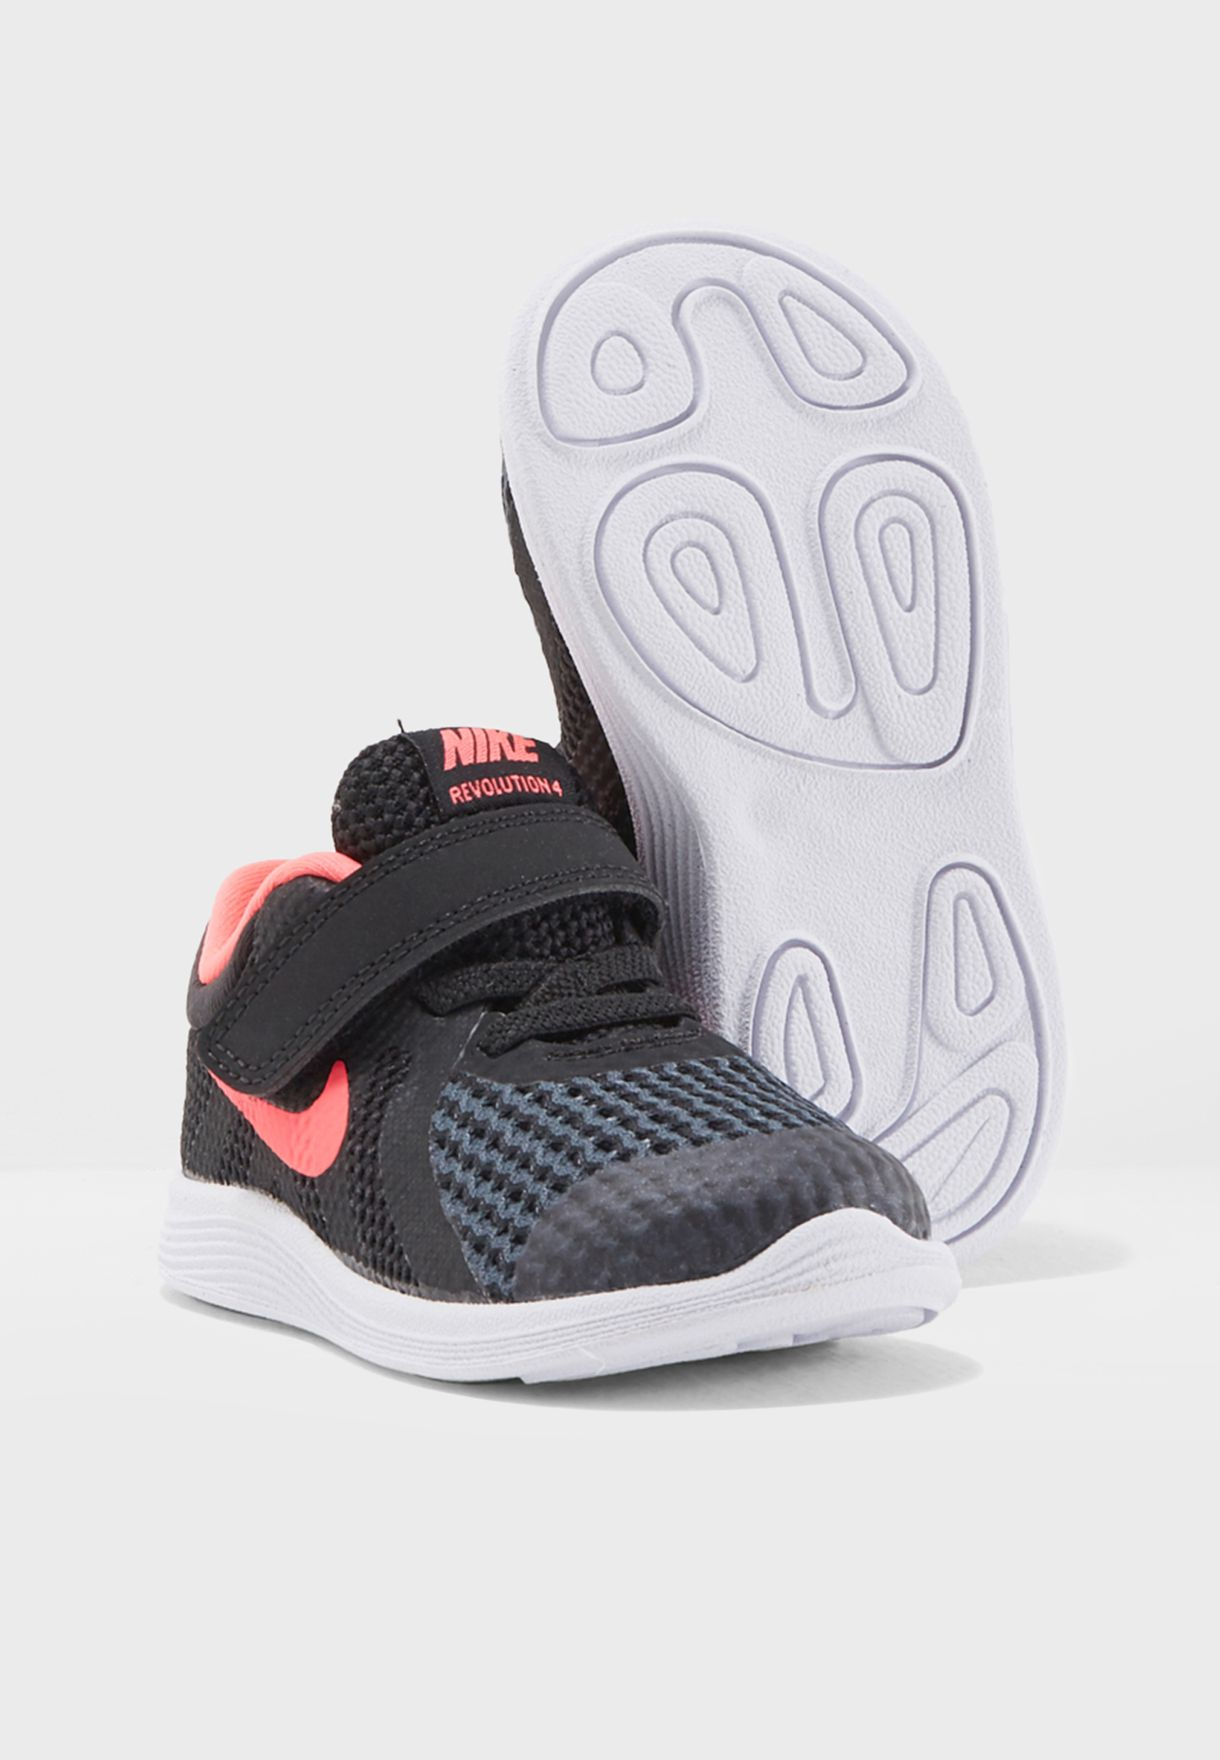 total Intacto Ineficiente  Buy Nike black Infant Revolution 4 for Kids in MENA, Worldwide | 943308-004